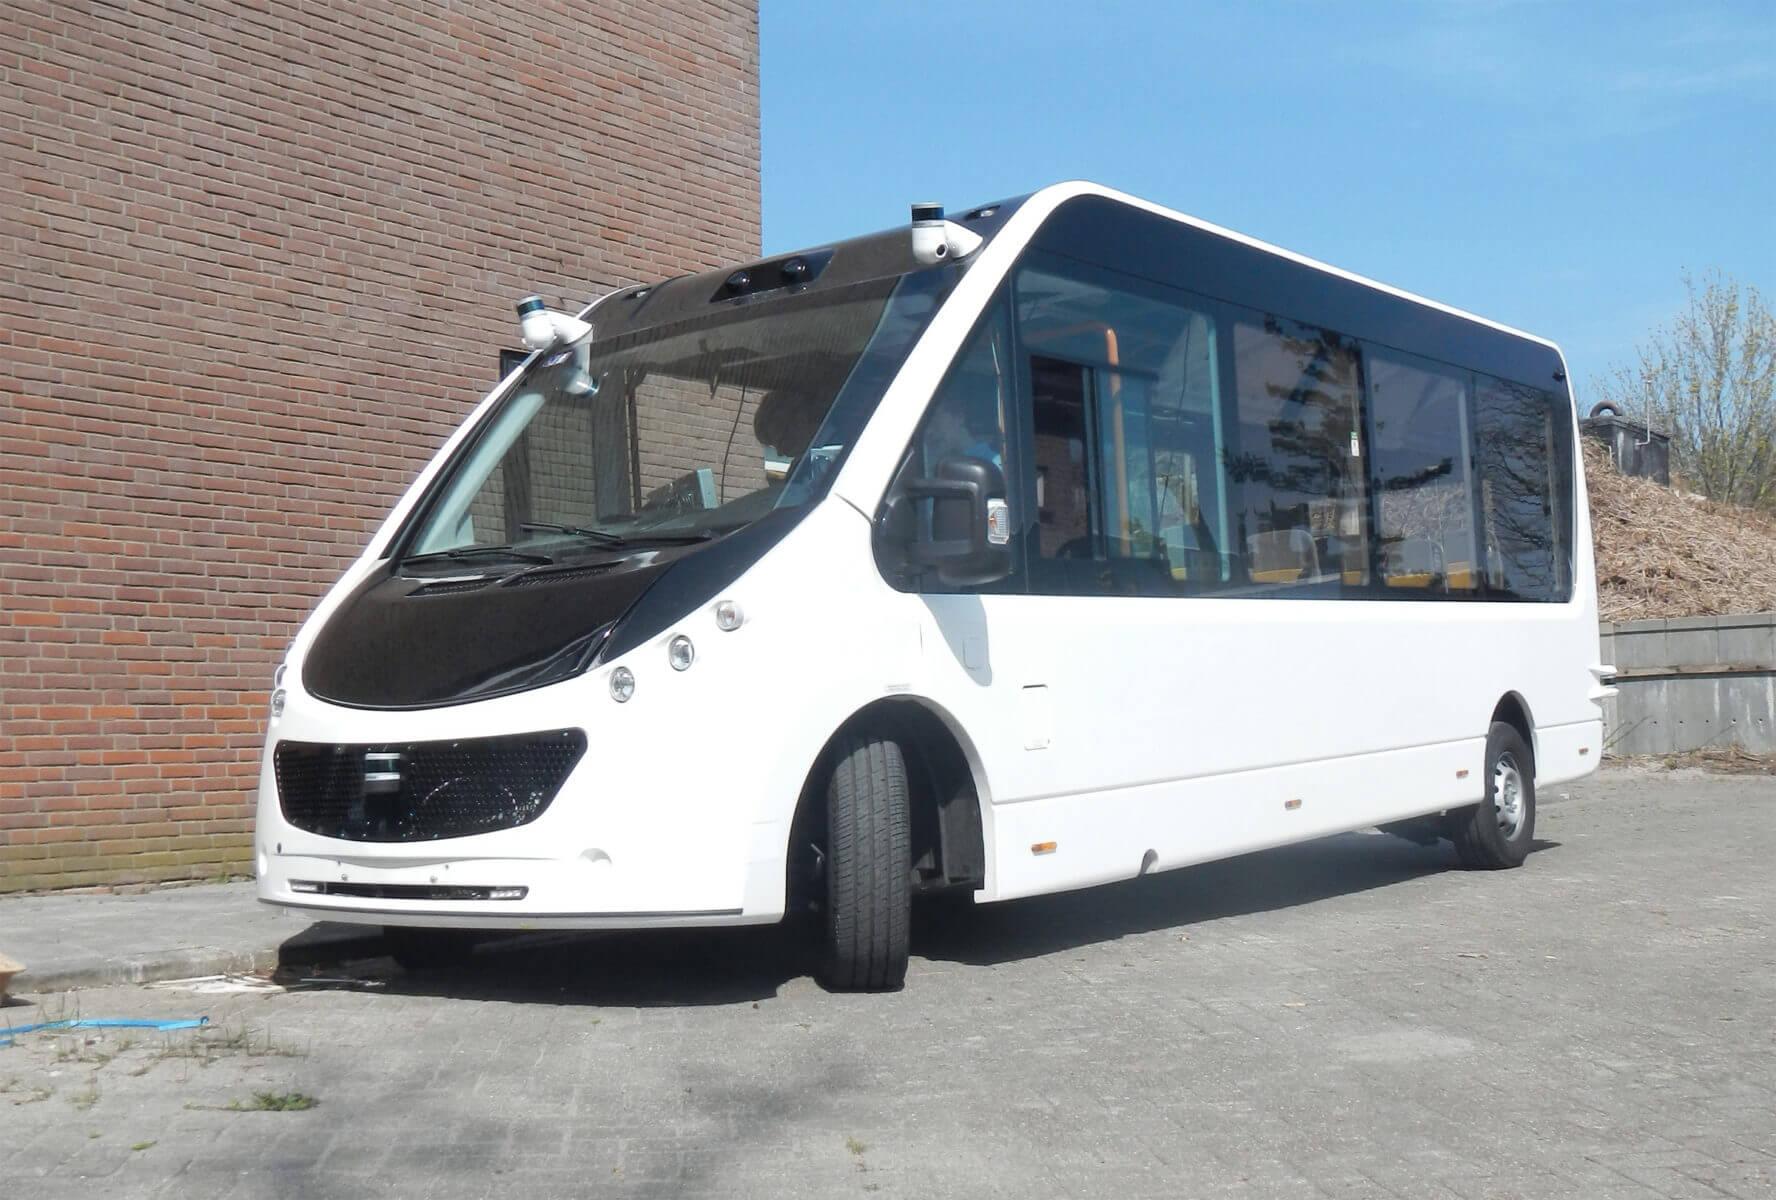 Aanzicht autonome Mission bus met sensoren